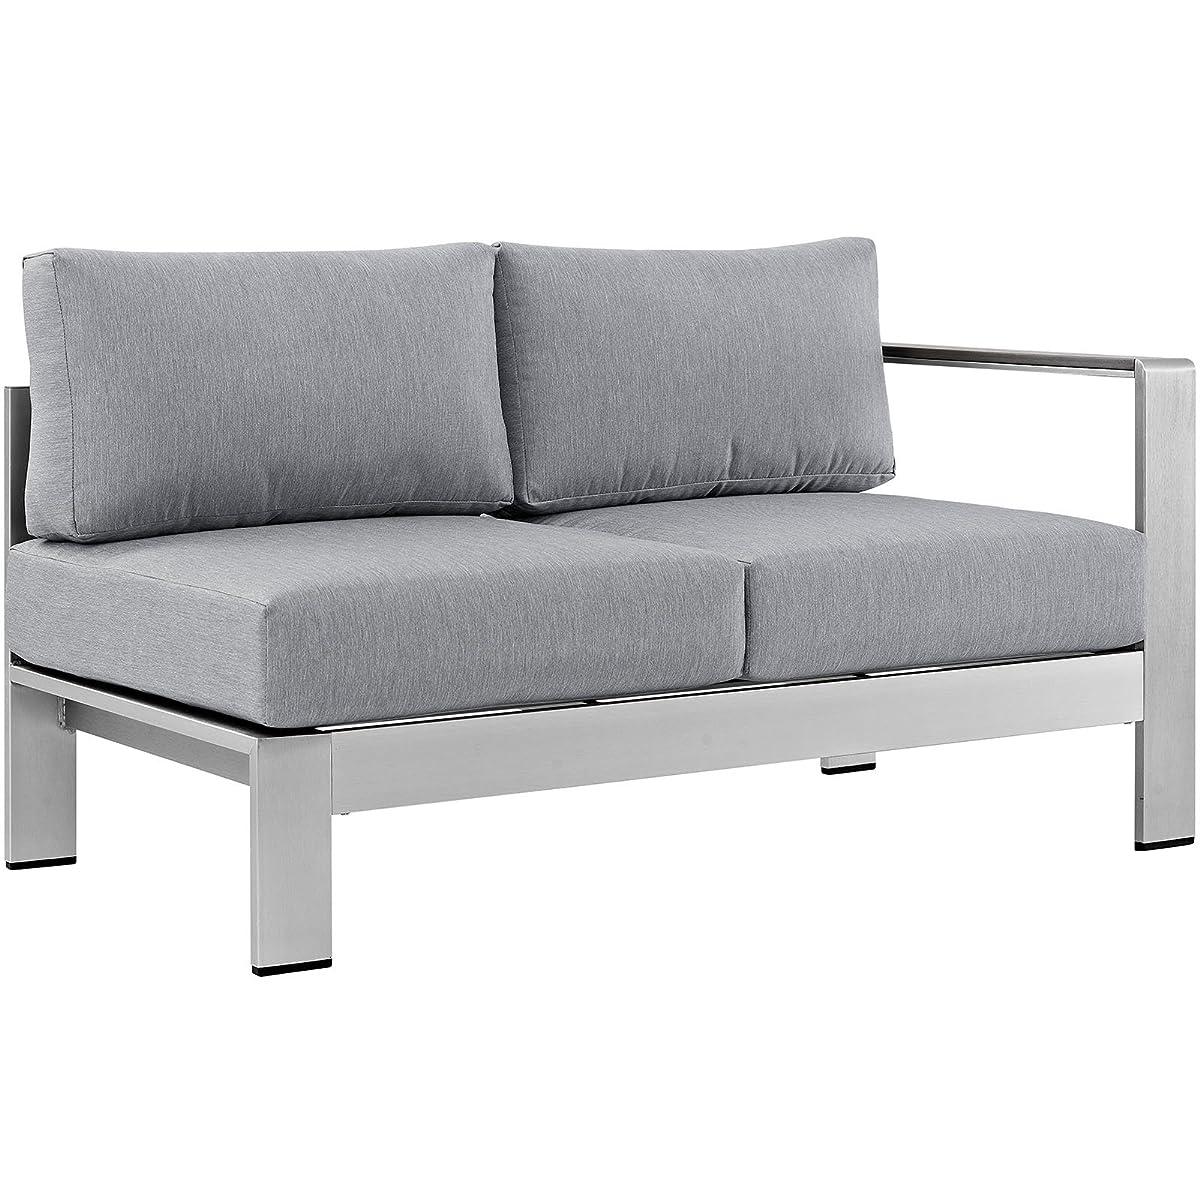 Modway Shore 6-Piece Aluminum Outdoor Patio Sectional Sofa Set in Silver Gray